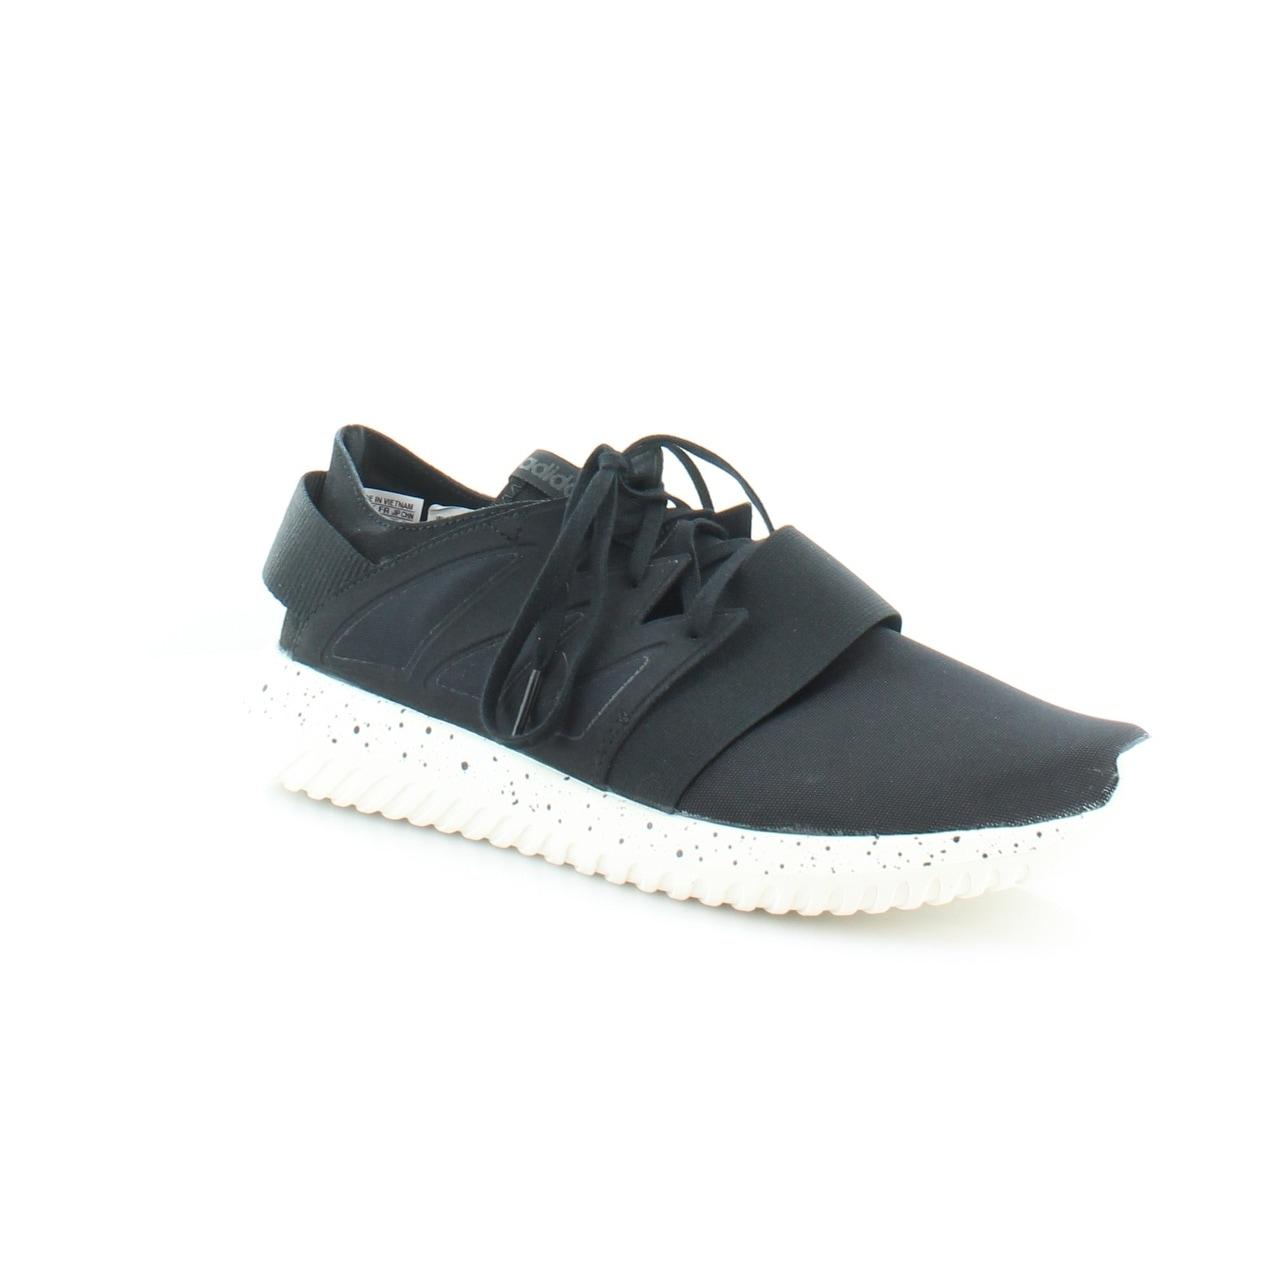 Shop Adidas Tubular Viral Women s Athletic Black - Free Shipping ... c2576bdbd